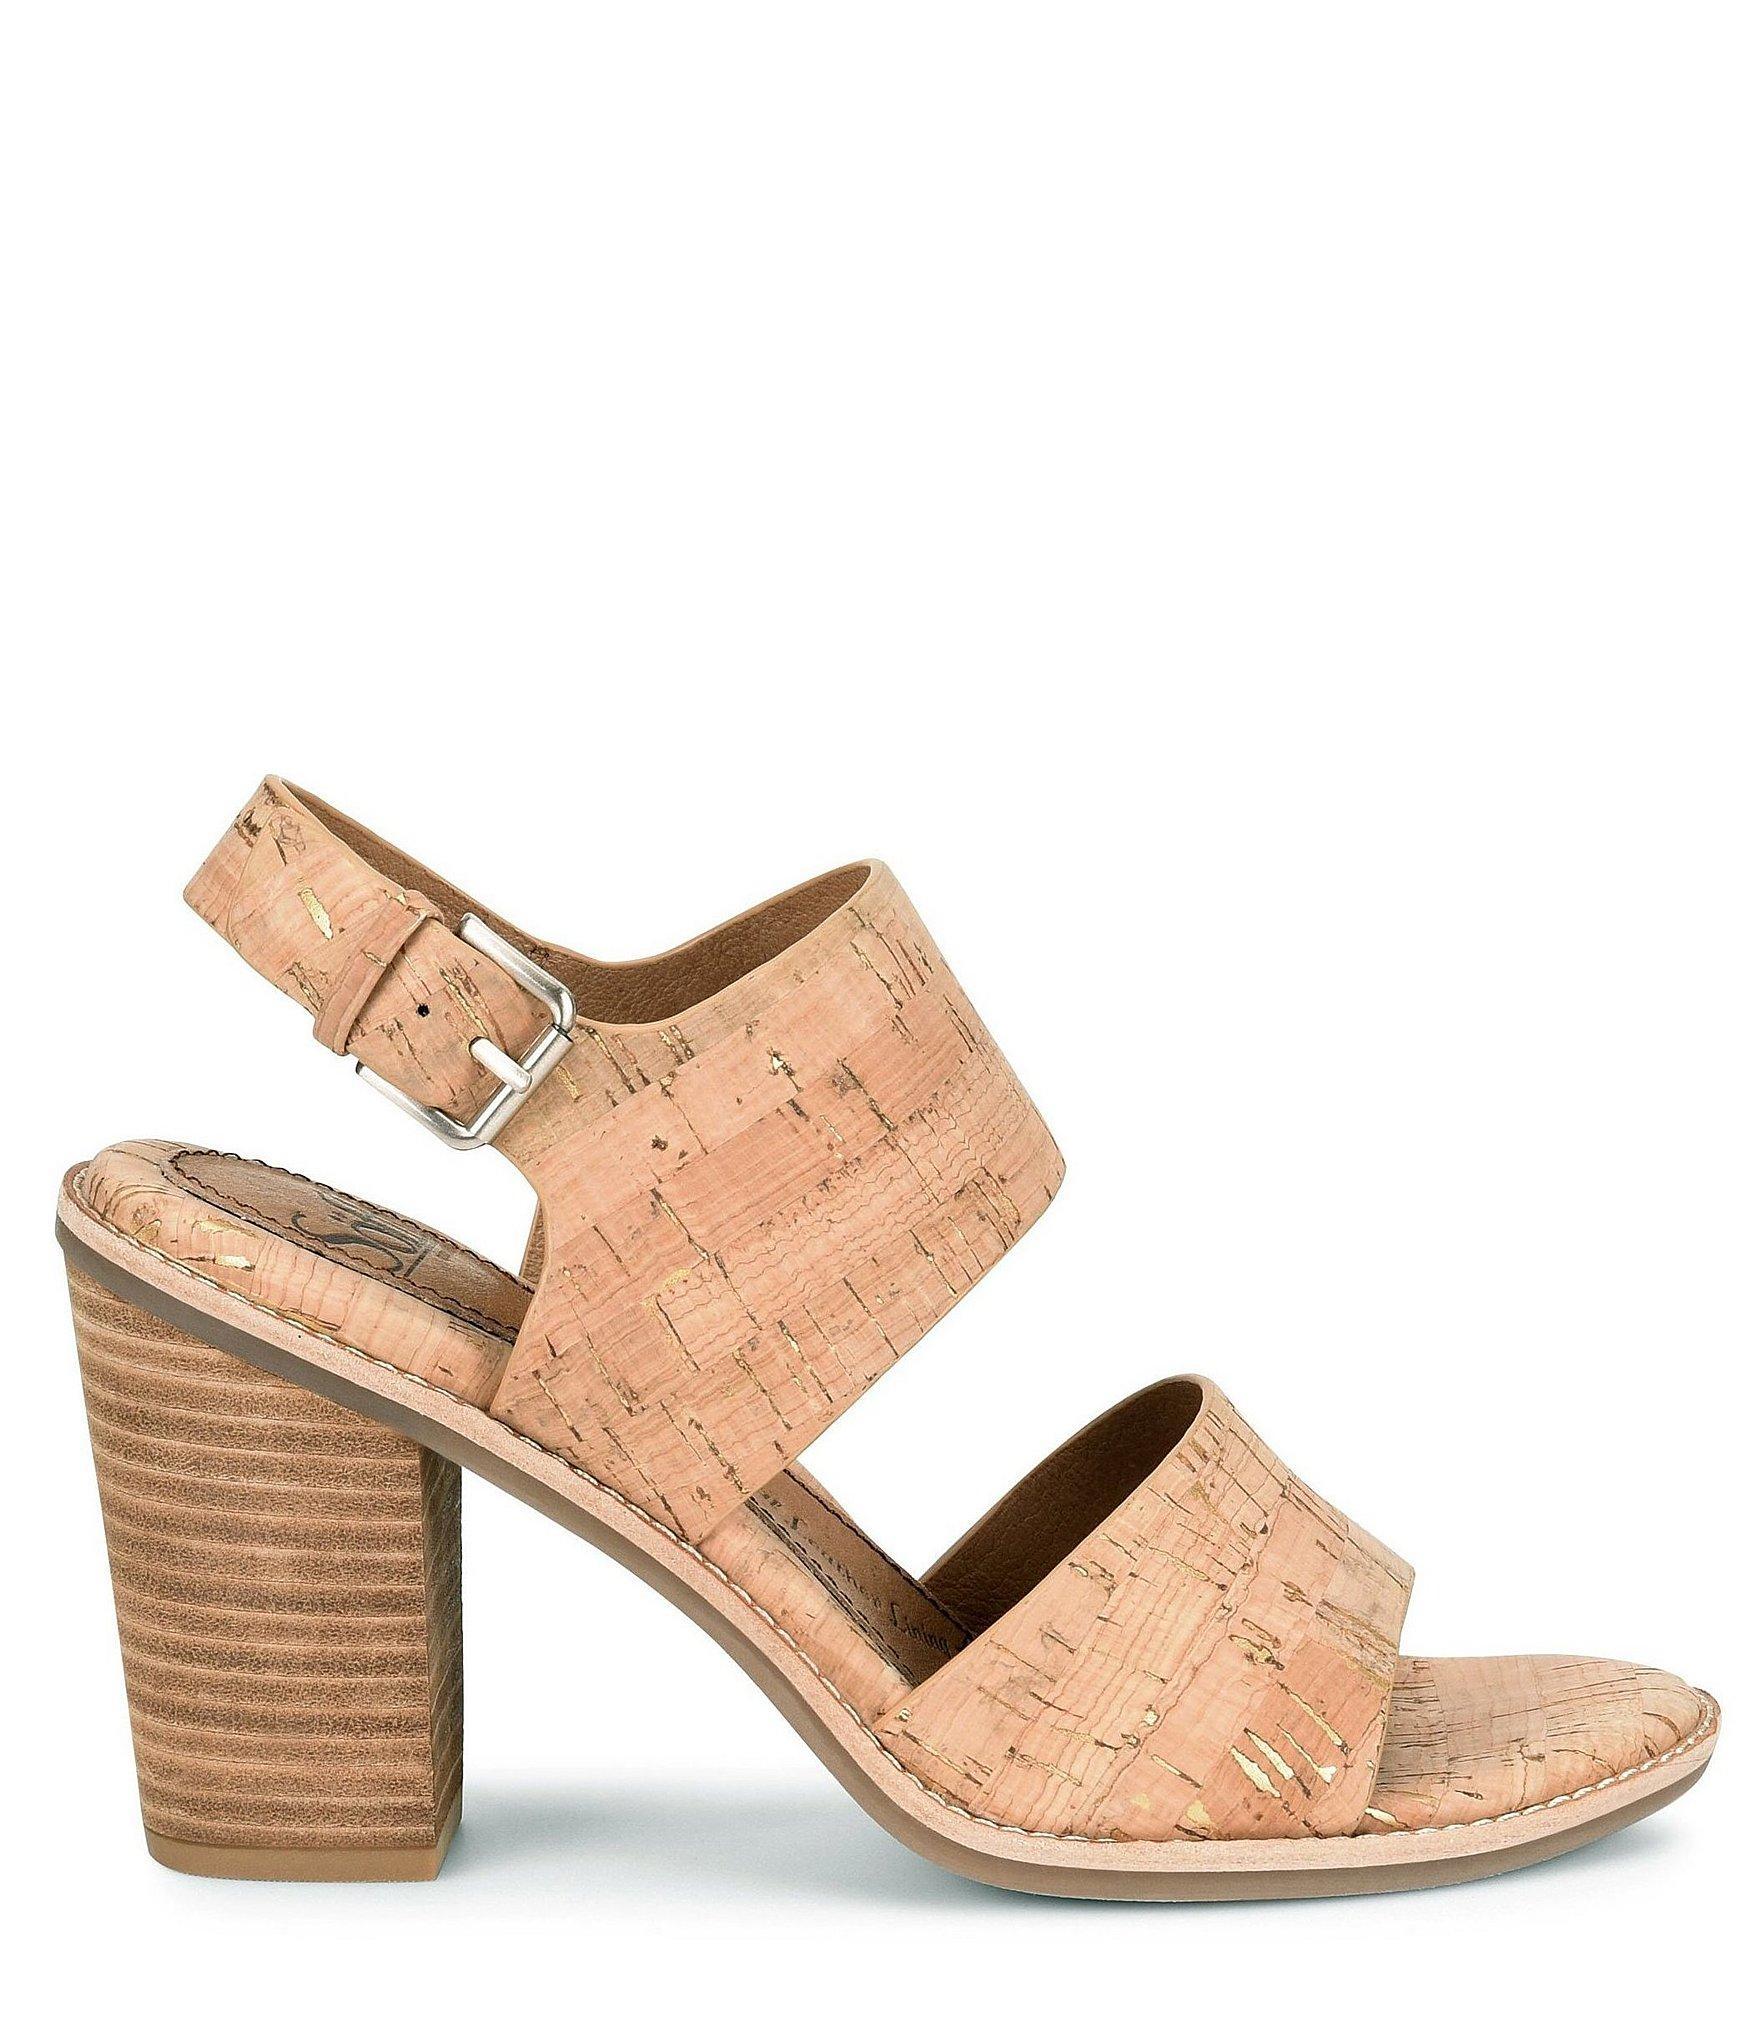 be7f383d06d Lyst - Söfft Pierz Cork Block Heel Sandals in Metallic